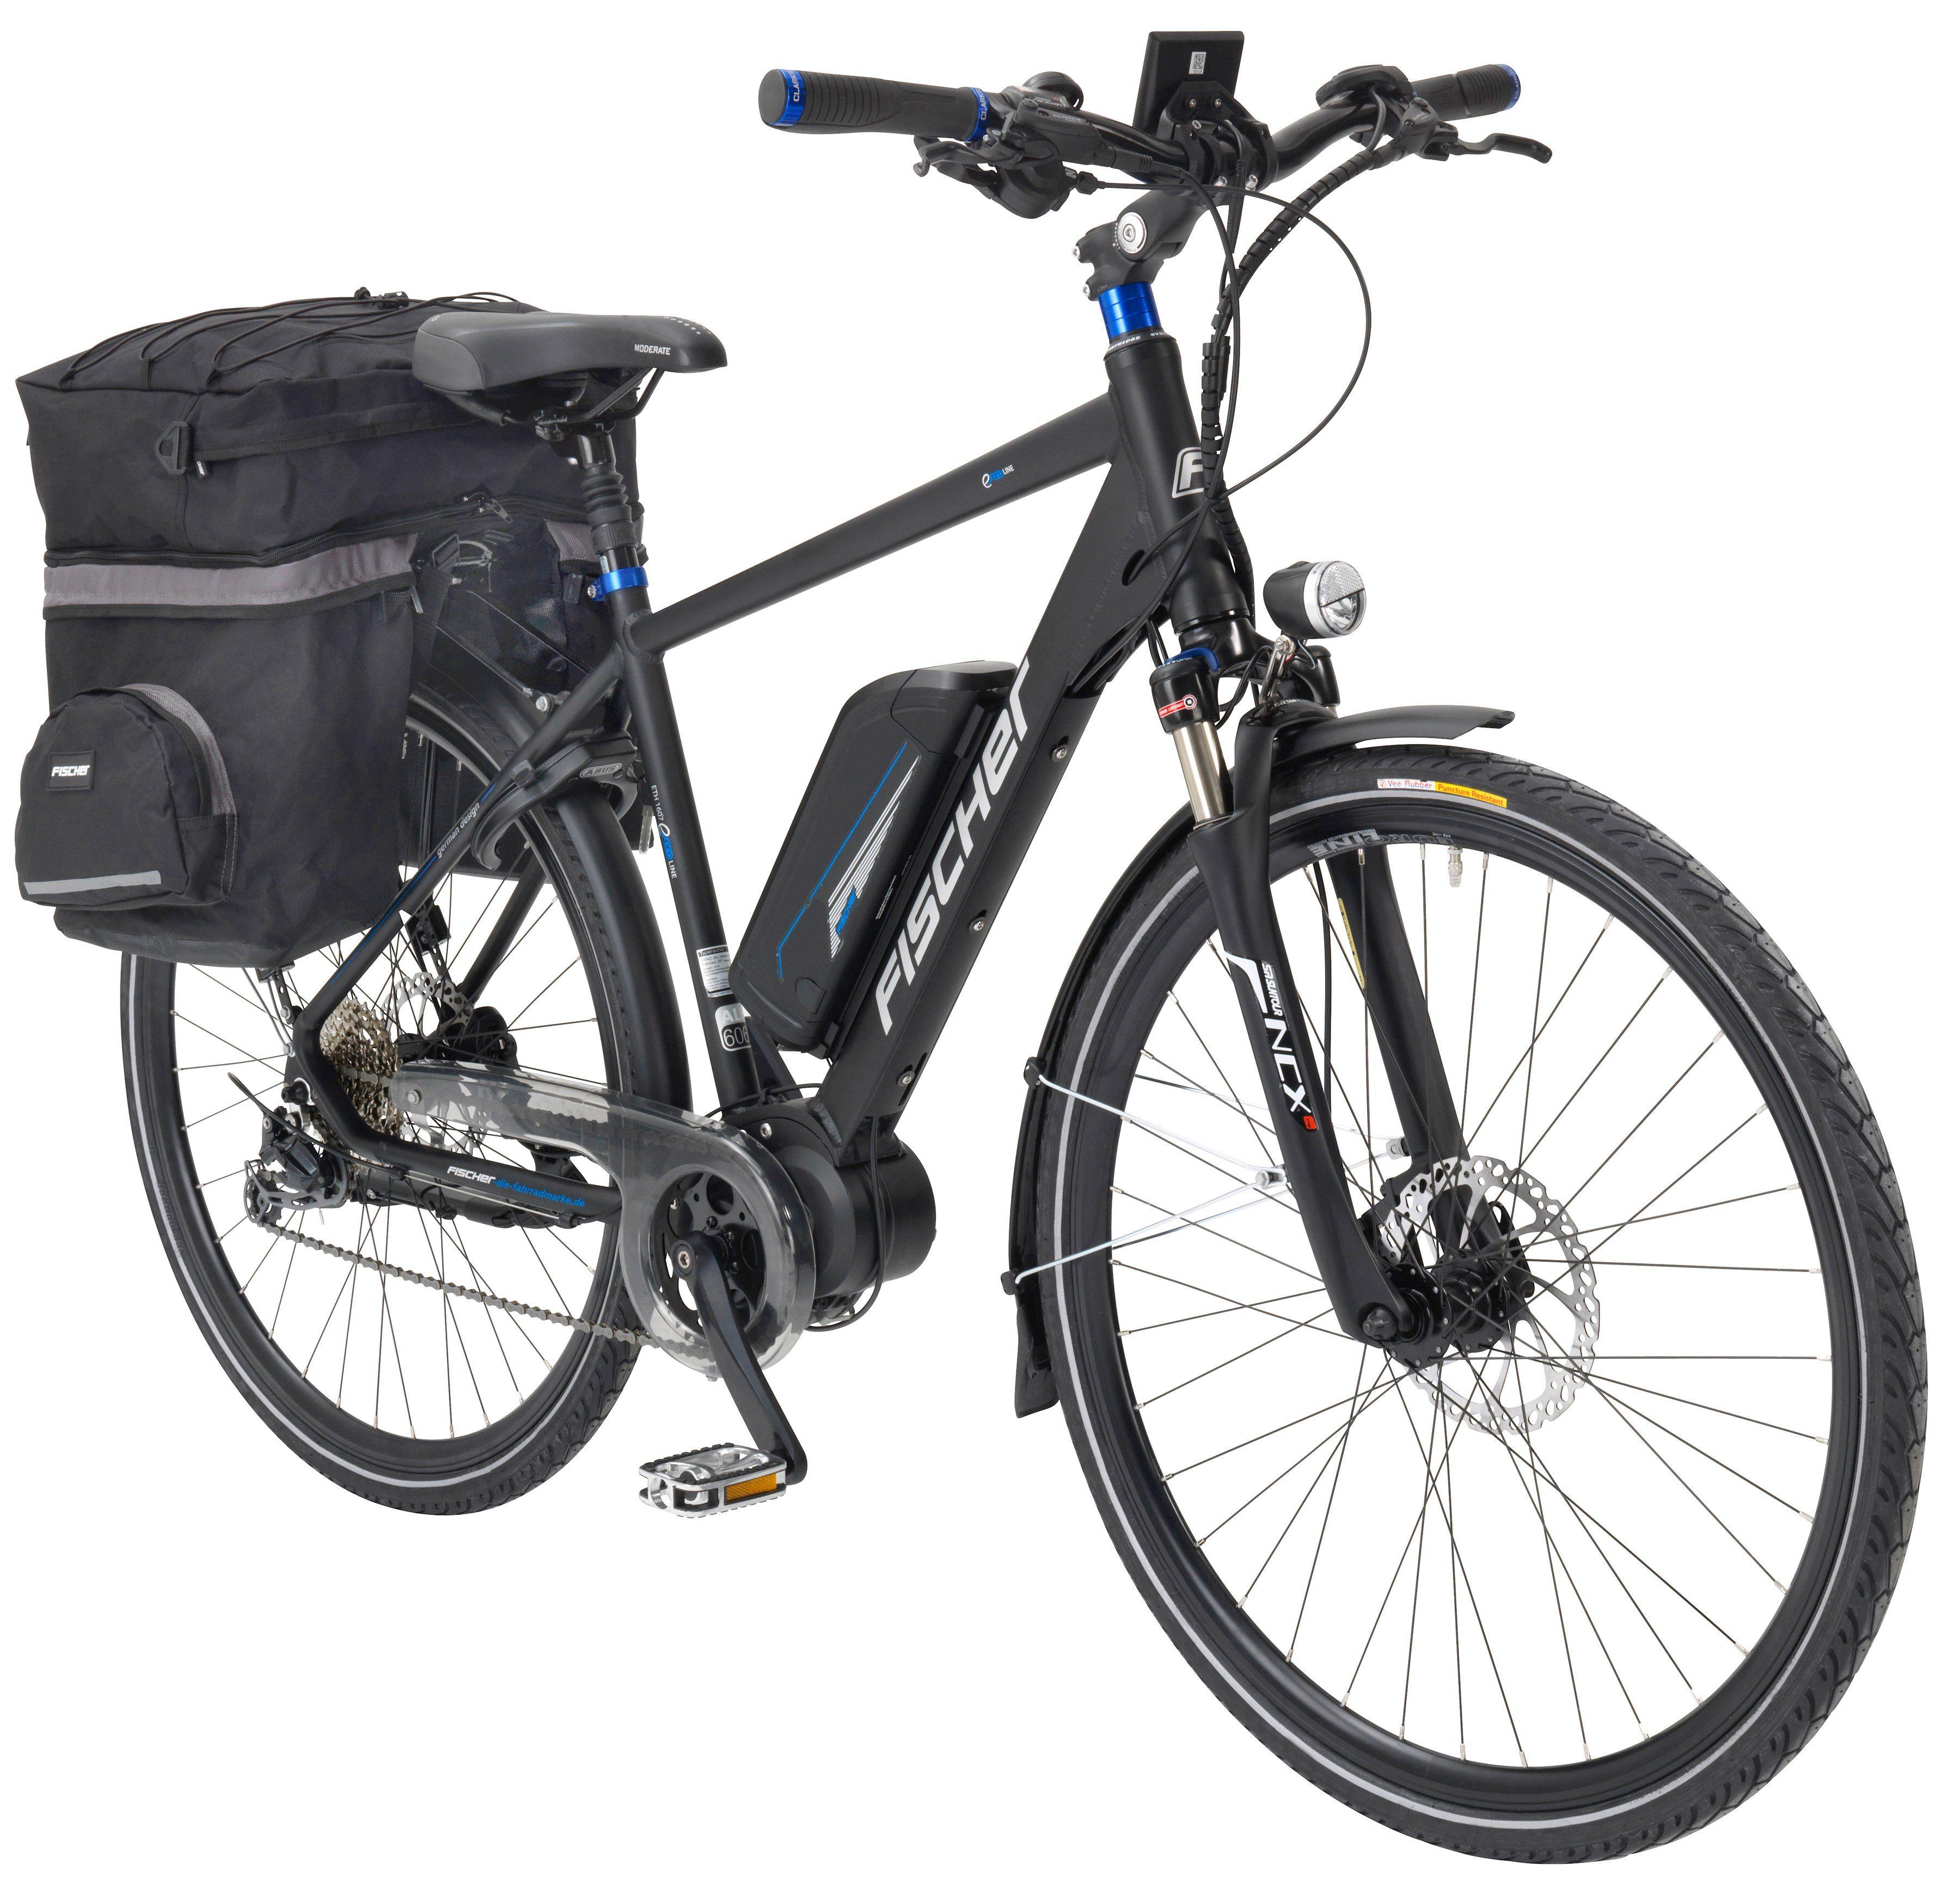 FISCHER FAHRRAEDER E-Bike Trekking Herren »ETH 1607-S2 by Joey Kelly«, 28 Zoll, 9 Gang, Mittelmotor